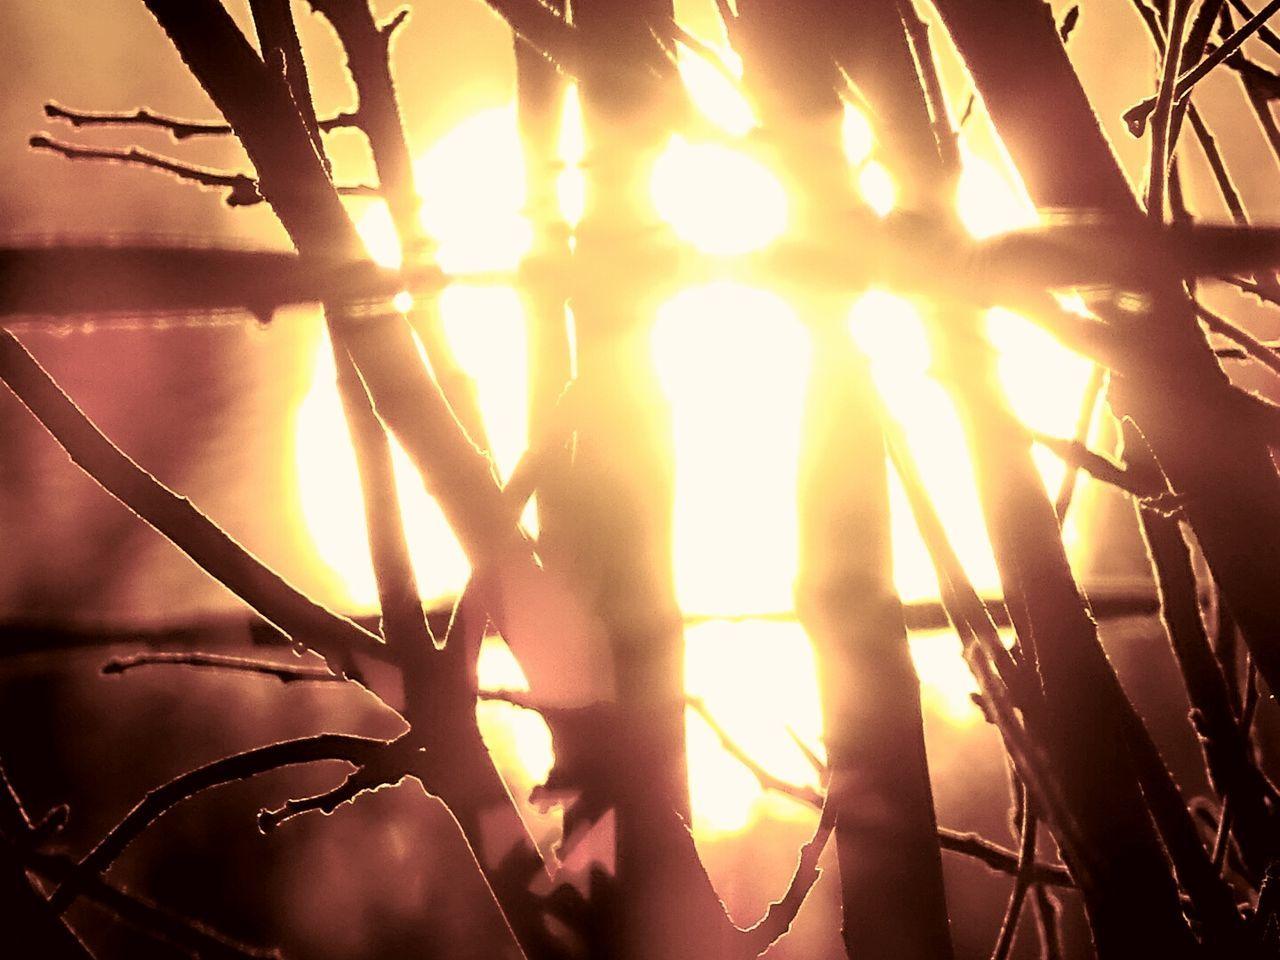 Sun Light Through Trees Sun Light Tree Outline Tree Orange Sun Sunset Nature Backgrounds Enlightening Close-up Sky Beauty In Nature EyeEm Getty Collection EyeEm Gallery Beauty In Nature Outdoors